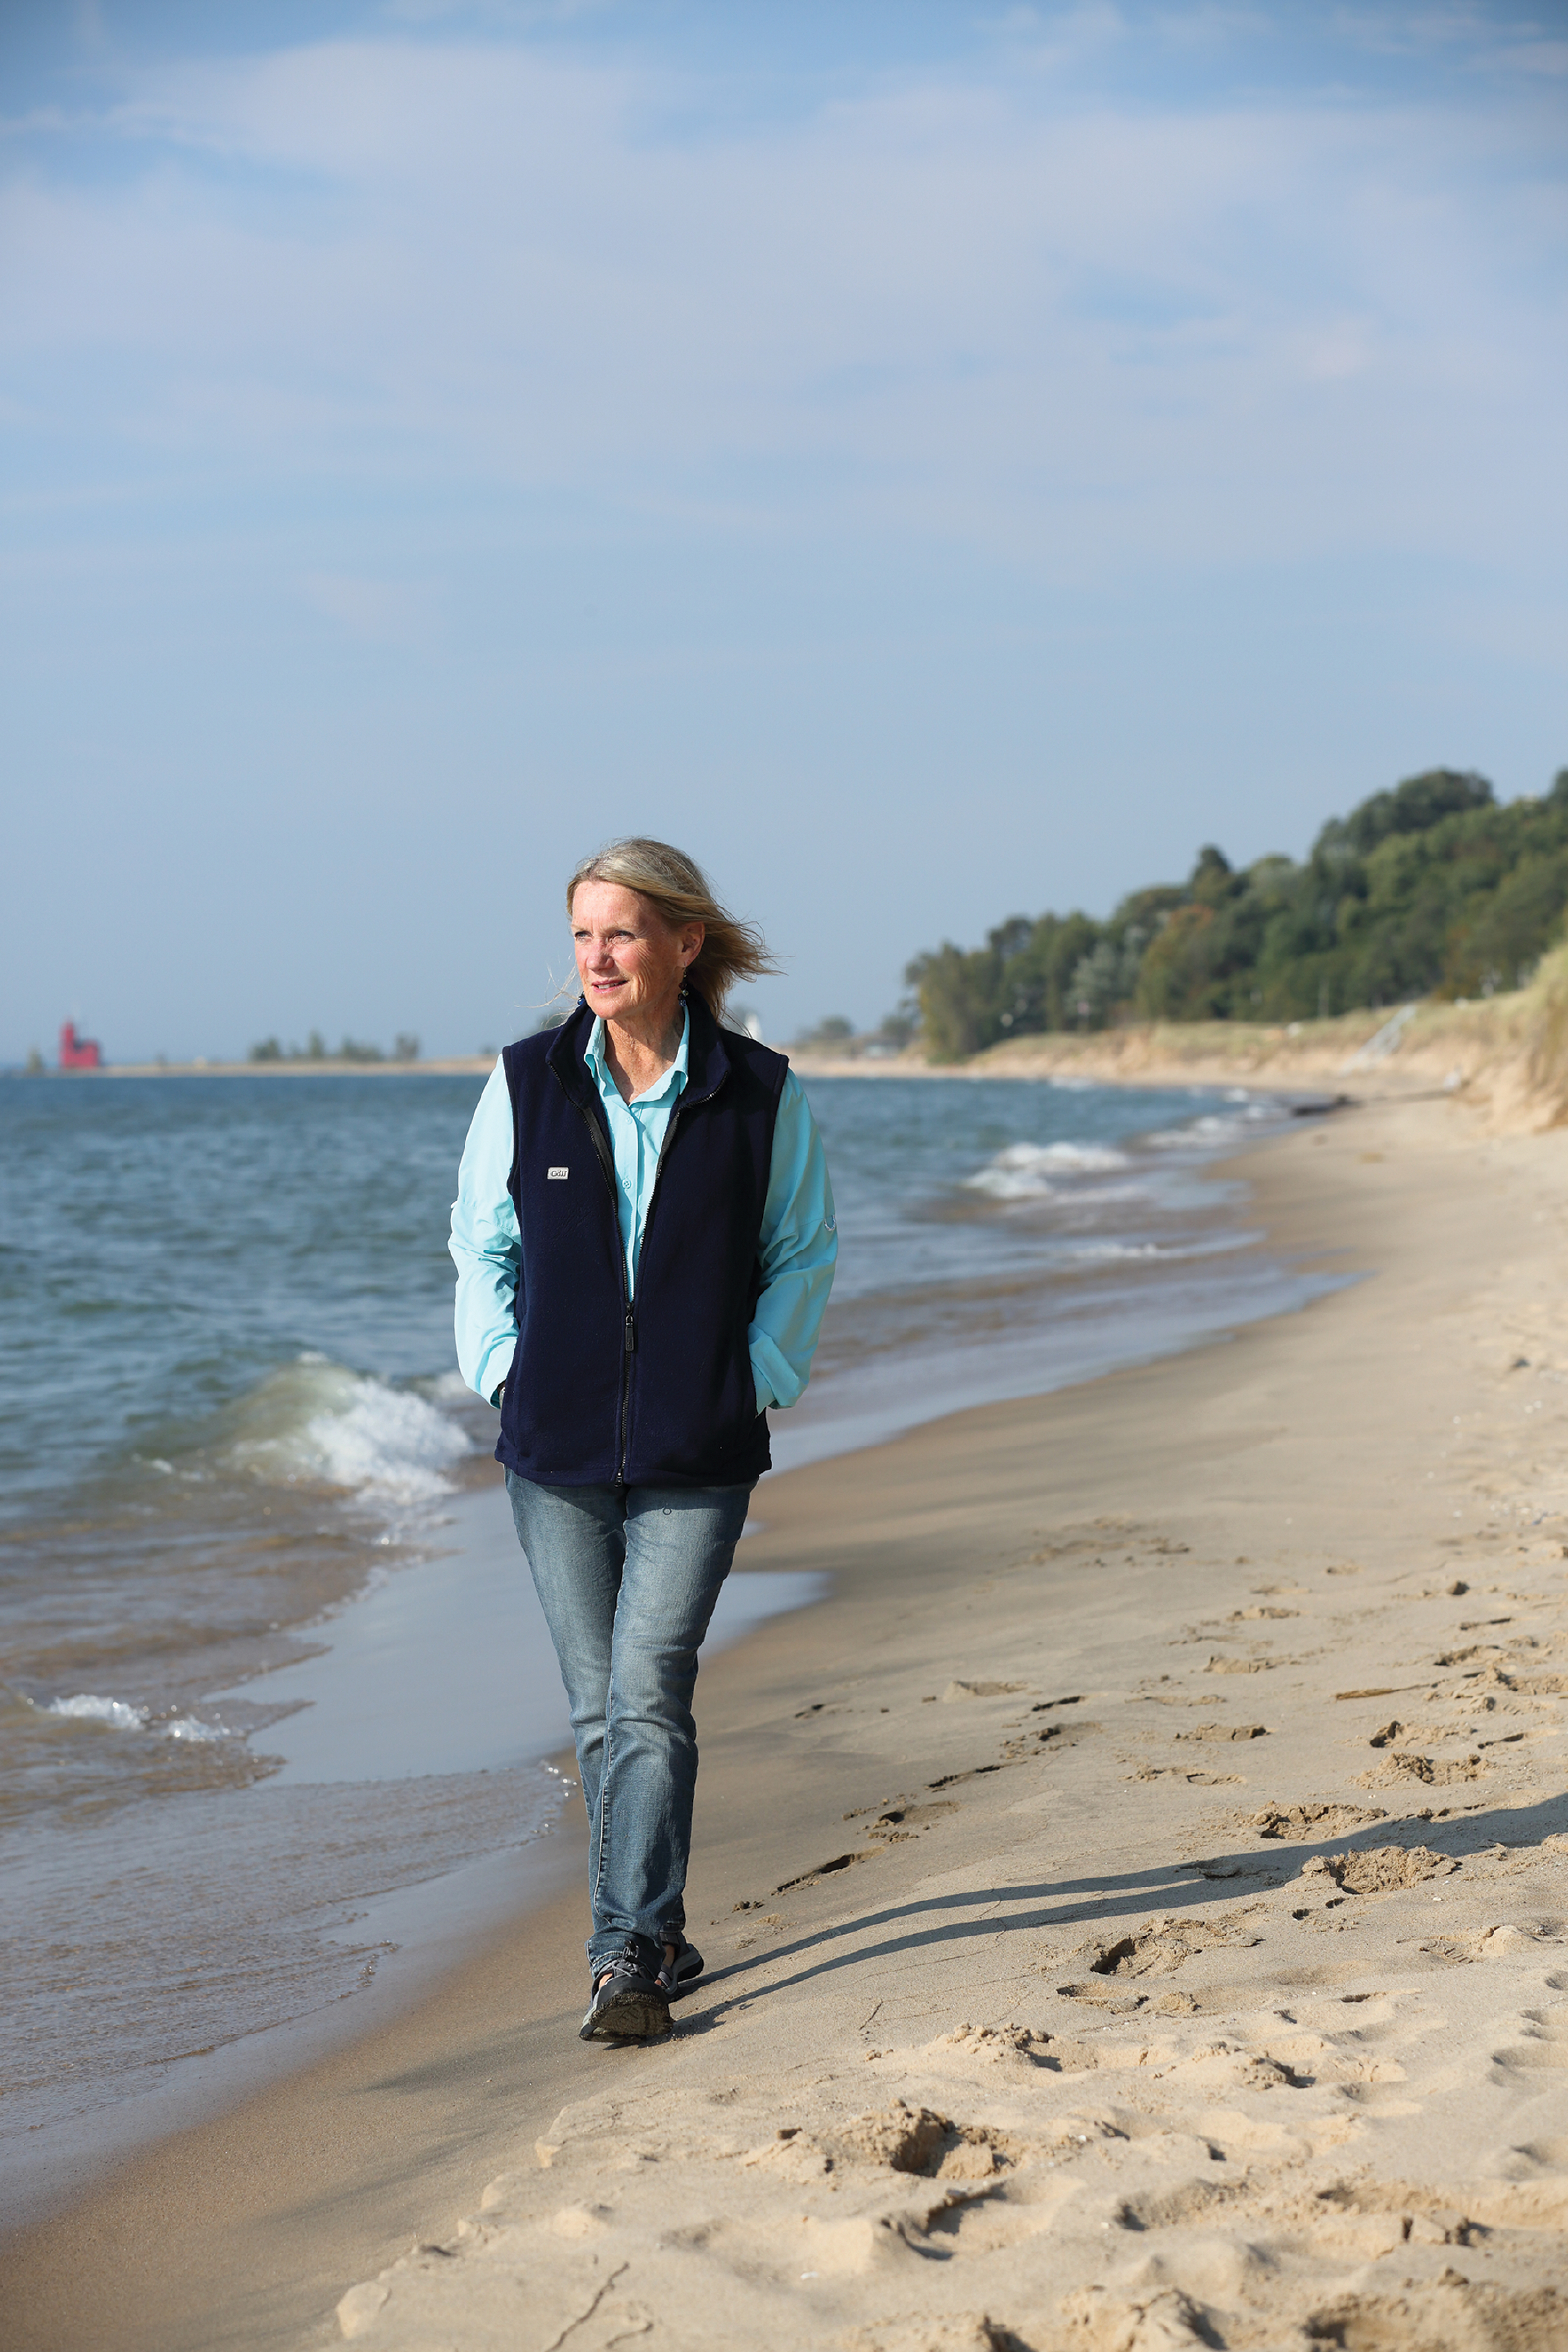 Author Mary McKSchmidt walks along the beach near their home in Holland, Michigan.